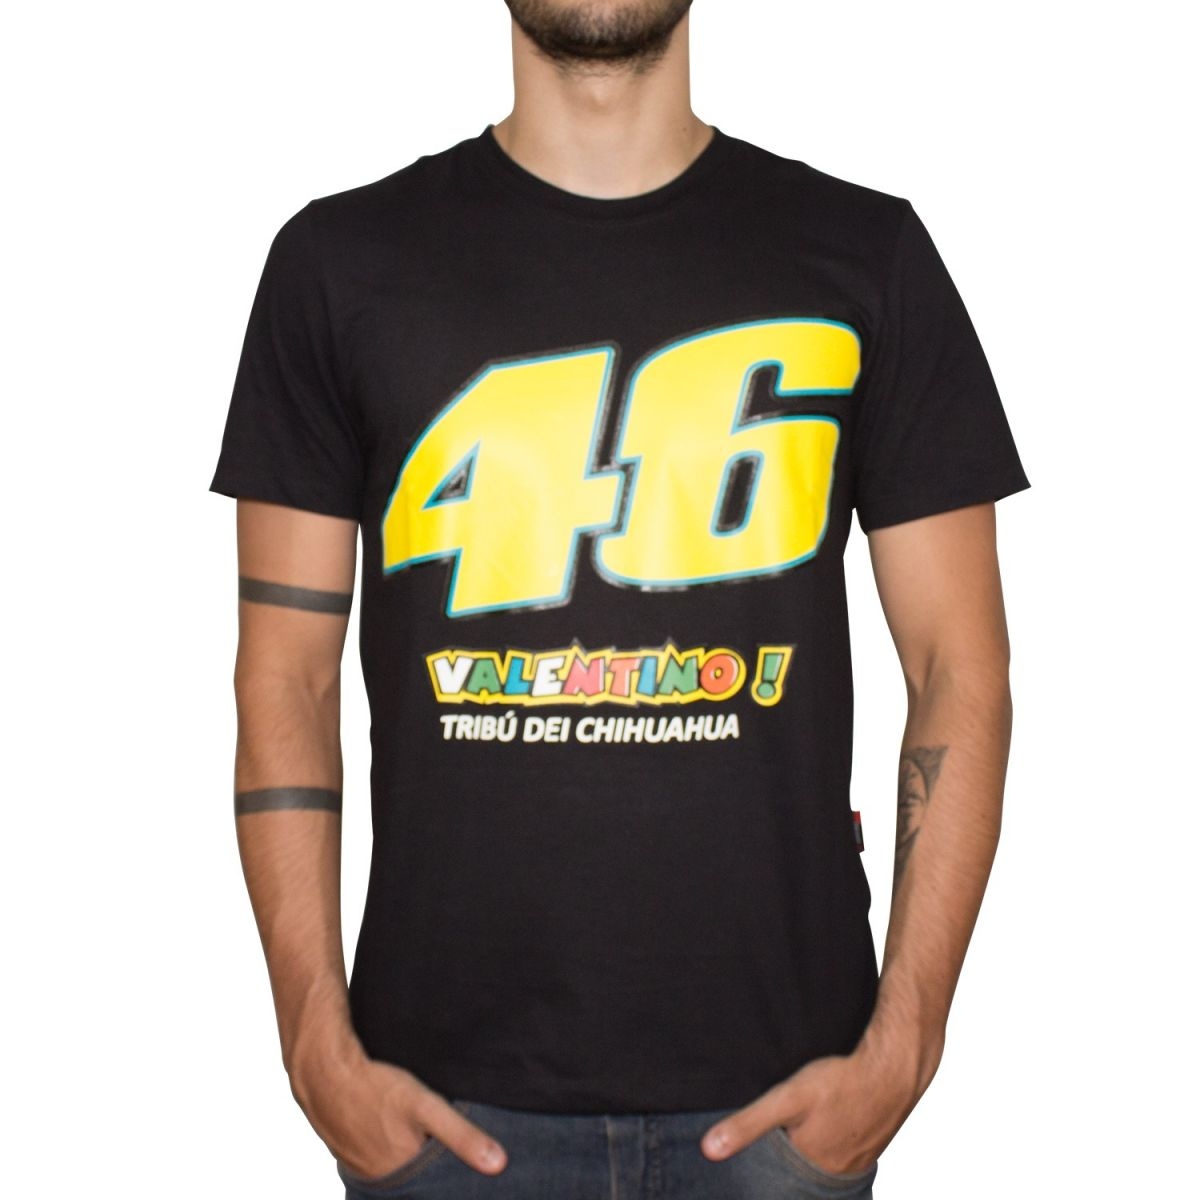 Camiseta Speed Race 46 Tribú Dei Chihuahua (Preta) Lançamento!!  - Super Bike - Loja Oficial Alpinestars